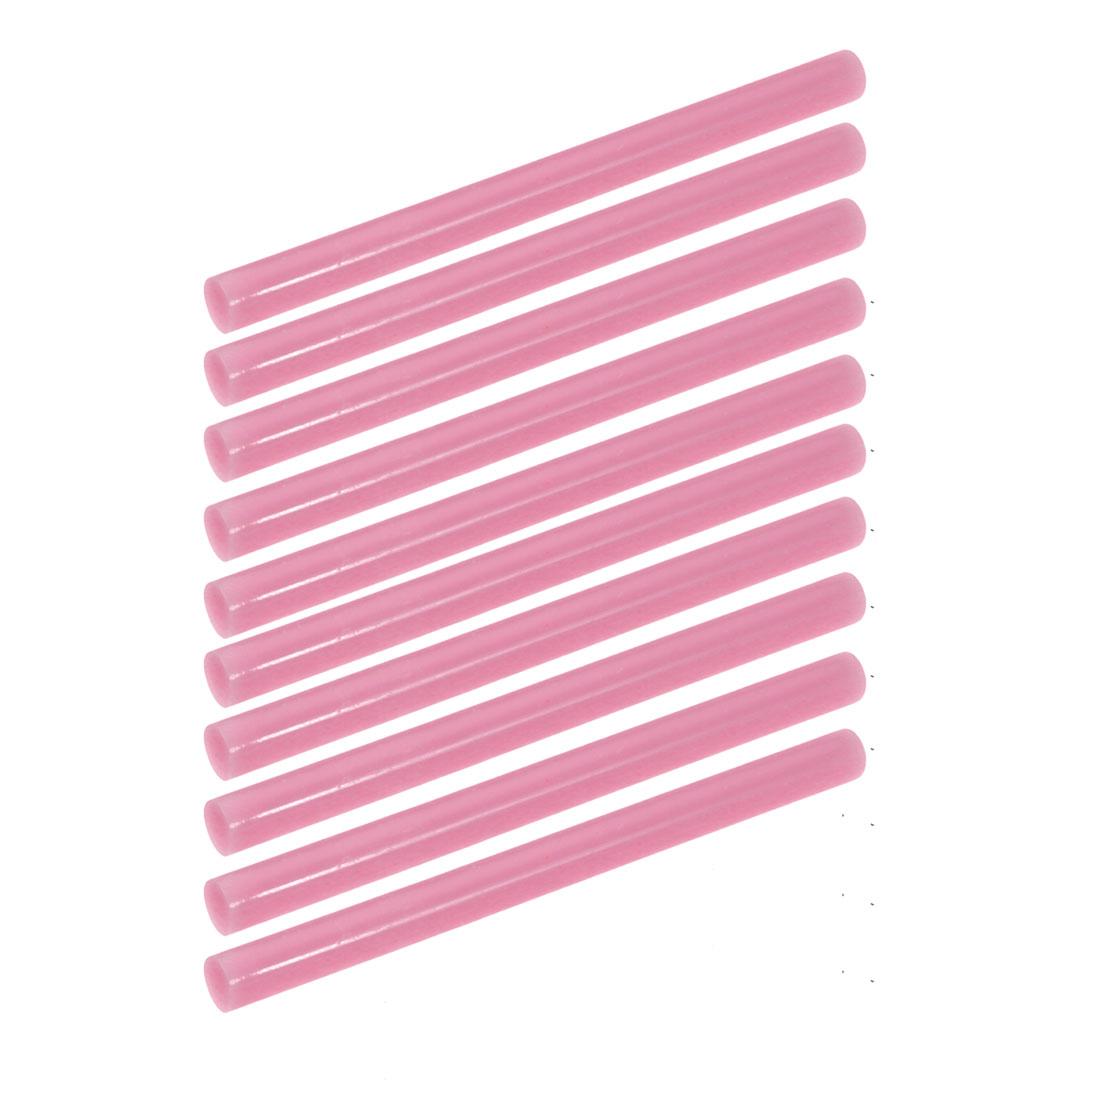 10pcs 7mm Dia 100mm Long Hot Melt Glue Adhesive Stick Light Pink